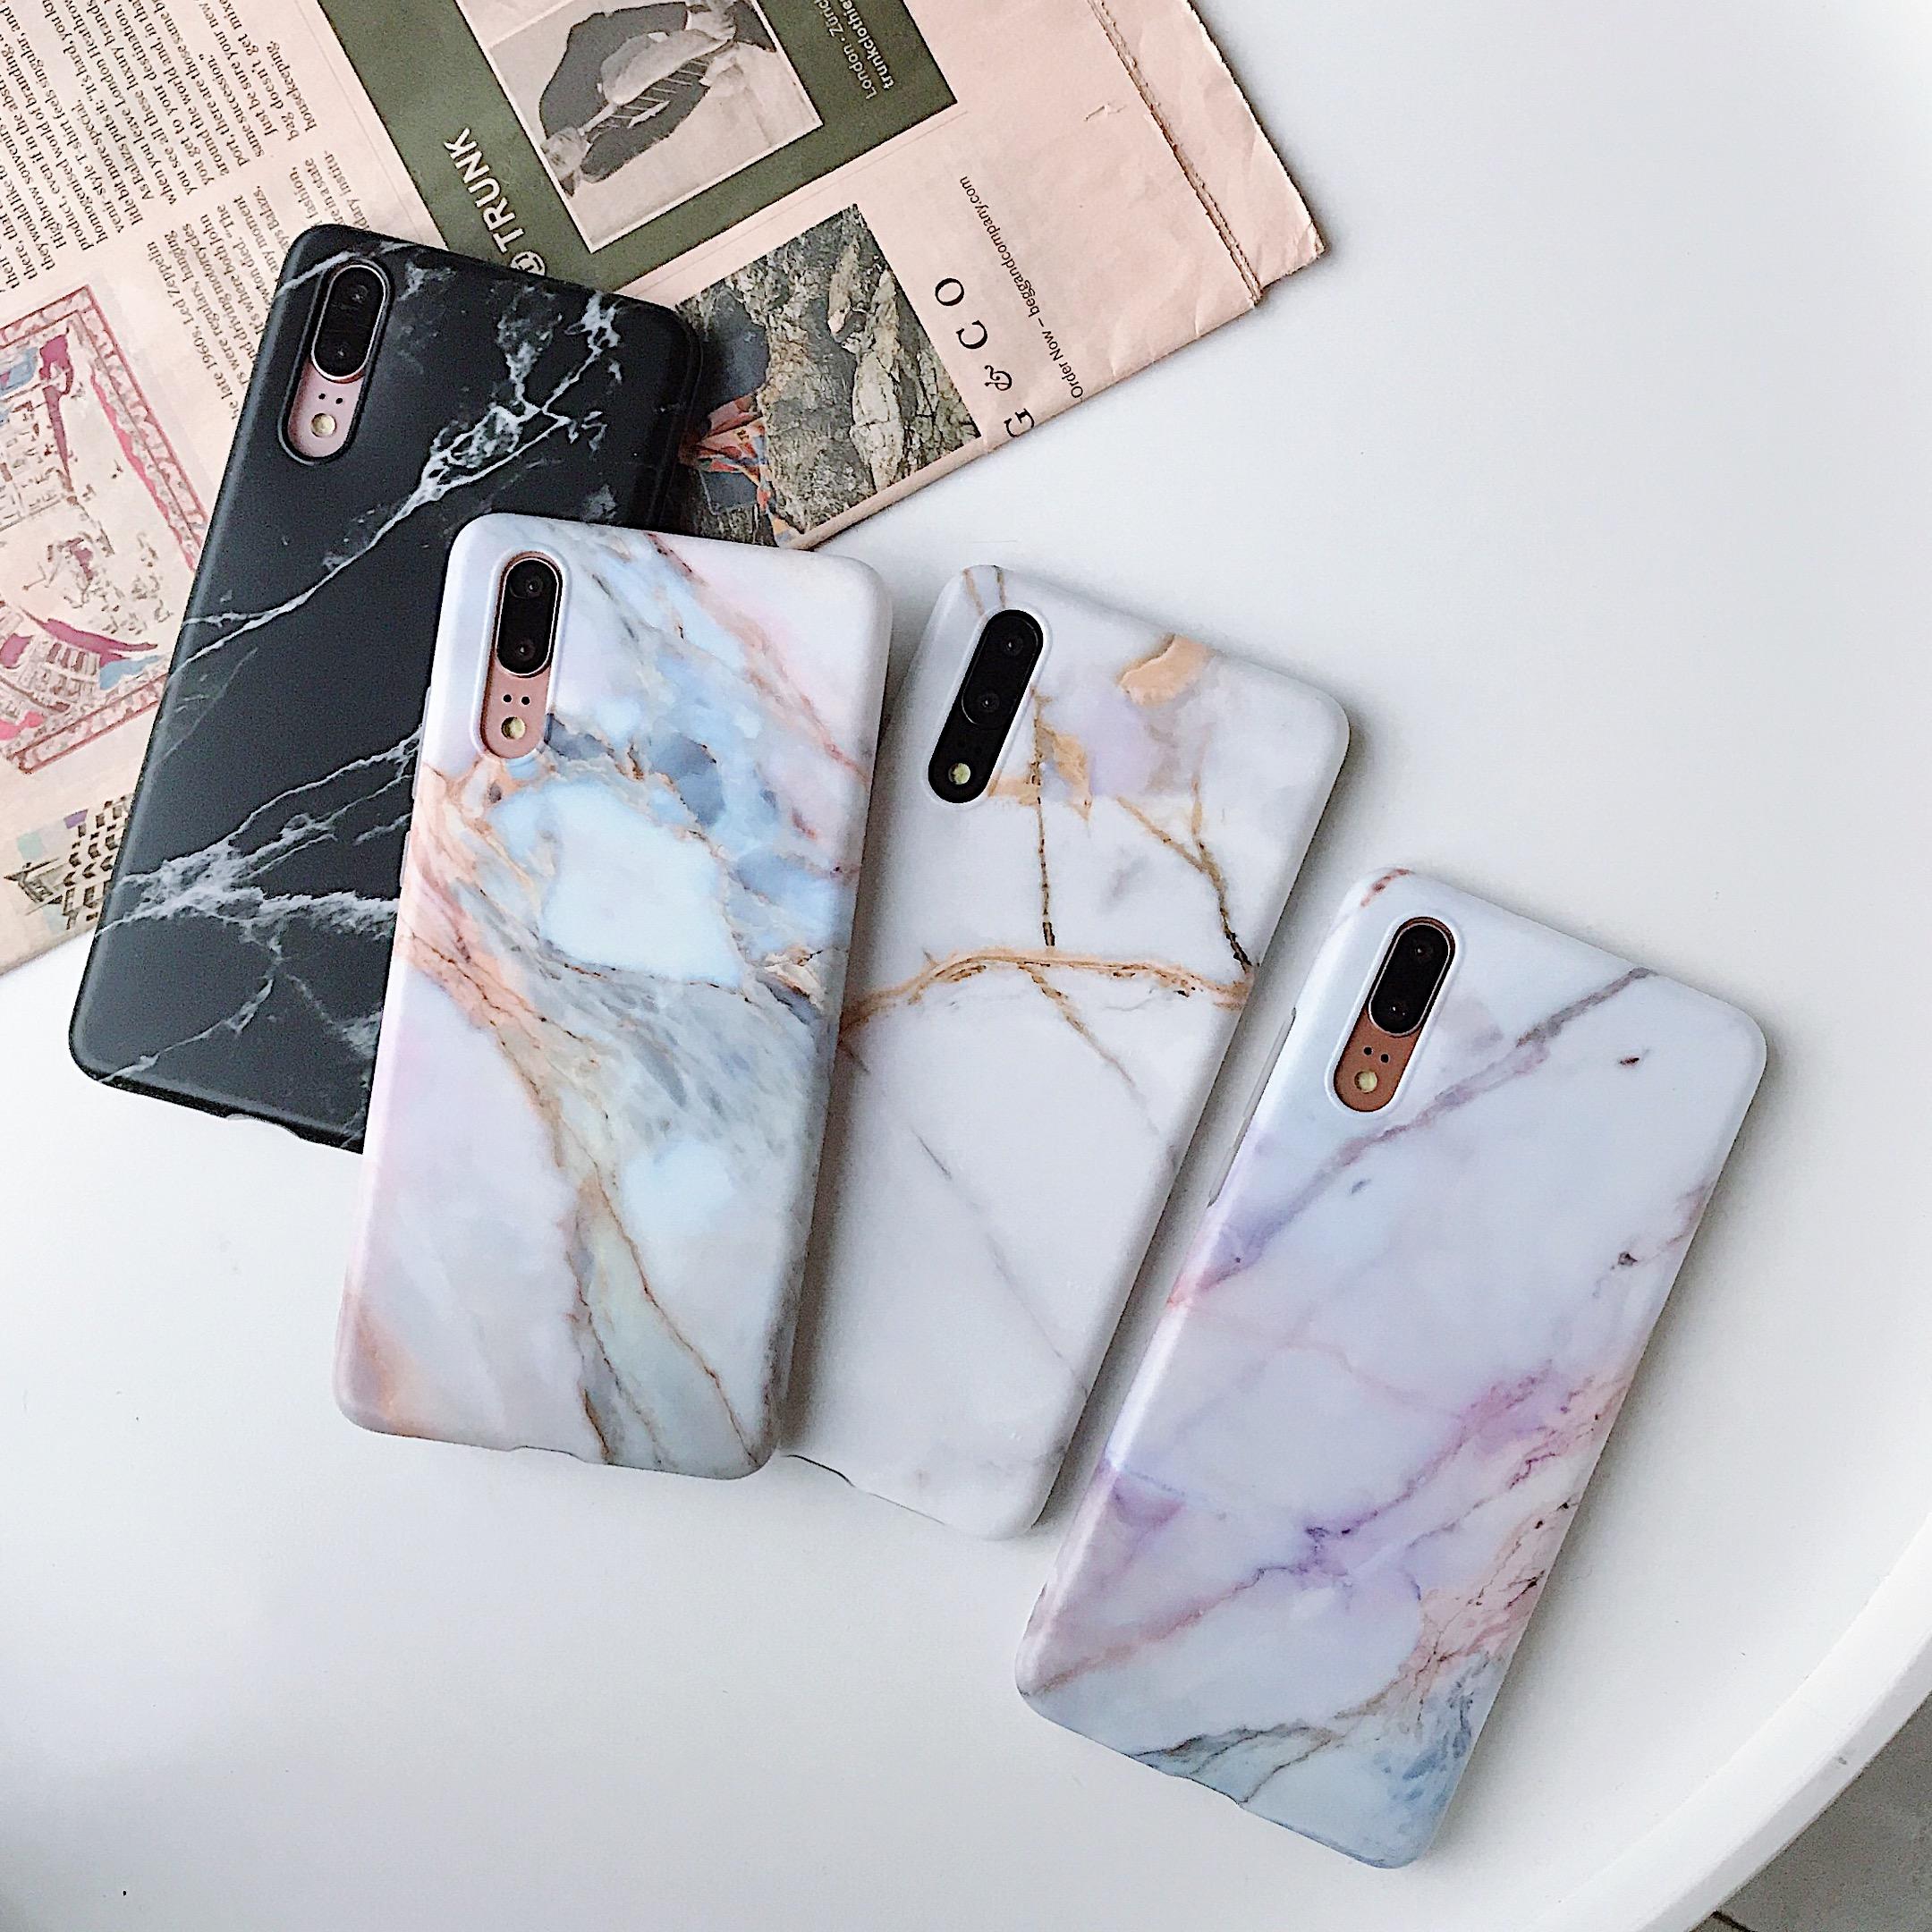 Huawei P20 PRO P30 PRO P30 LITE MATE20 PRO MATE20 LITE NOVA2S NOVA3 NOVA3I Marble Pattern TPU Material IMD Process Scrub Feel phone case